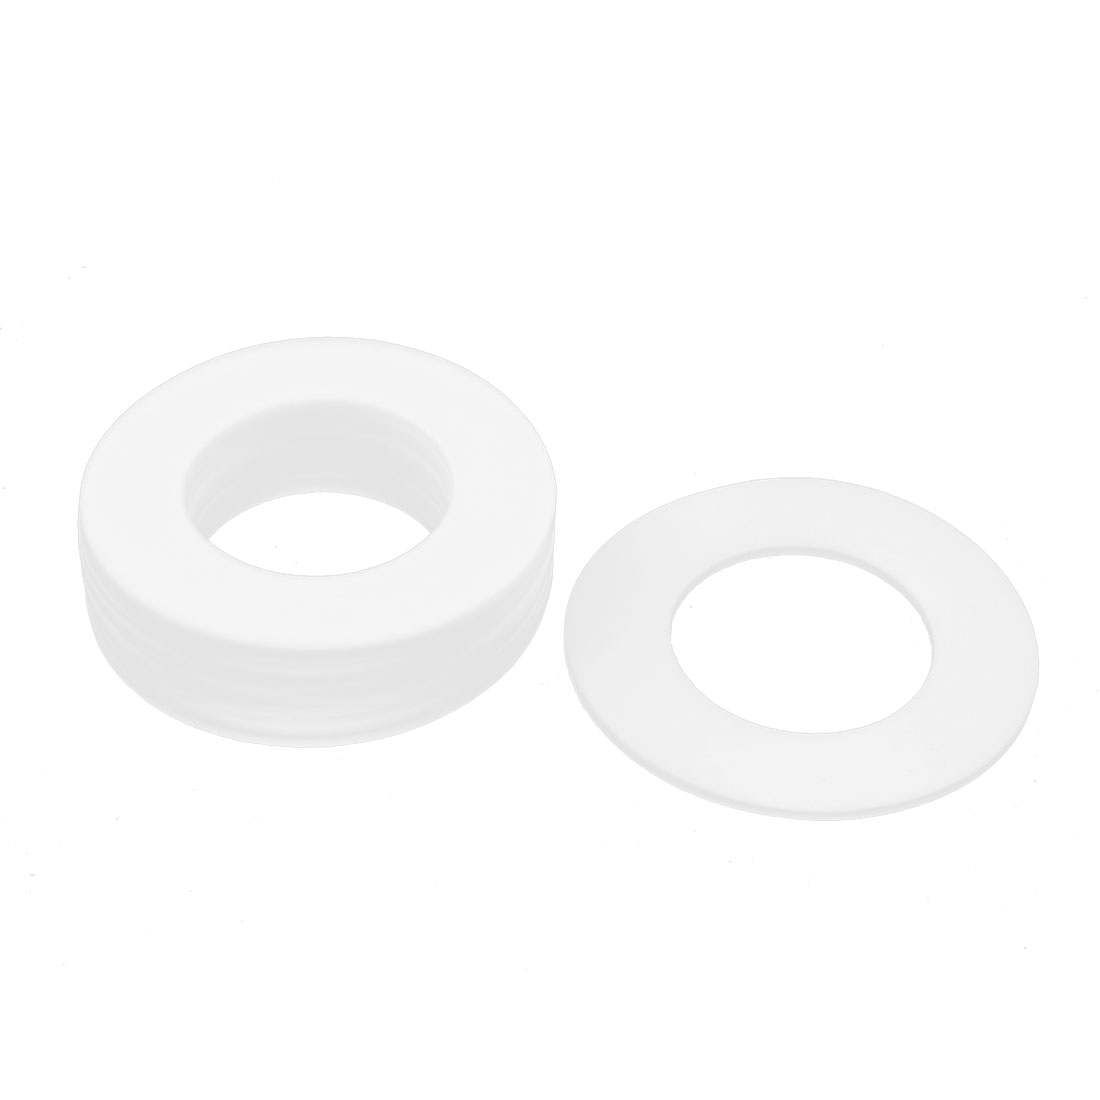 DN50 102 x 57 x 3mm PTFE Flange Gasket Sanitary Pipe Fitting Ferrule White 10Pcs